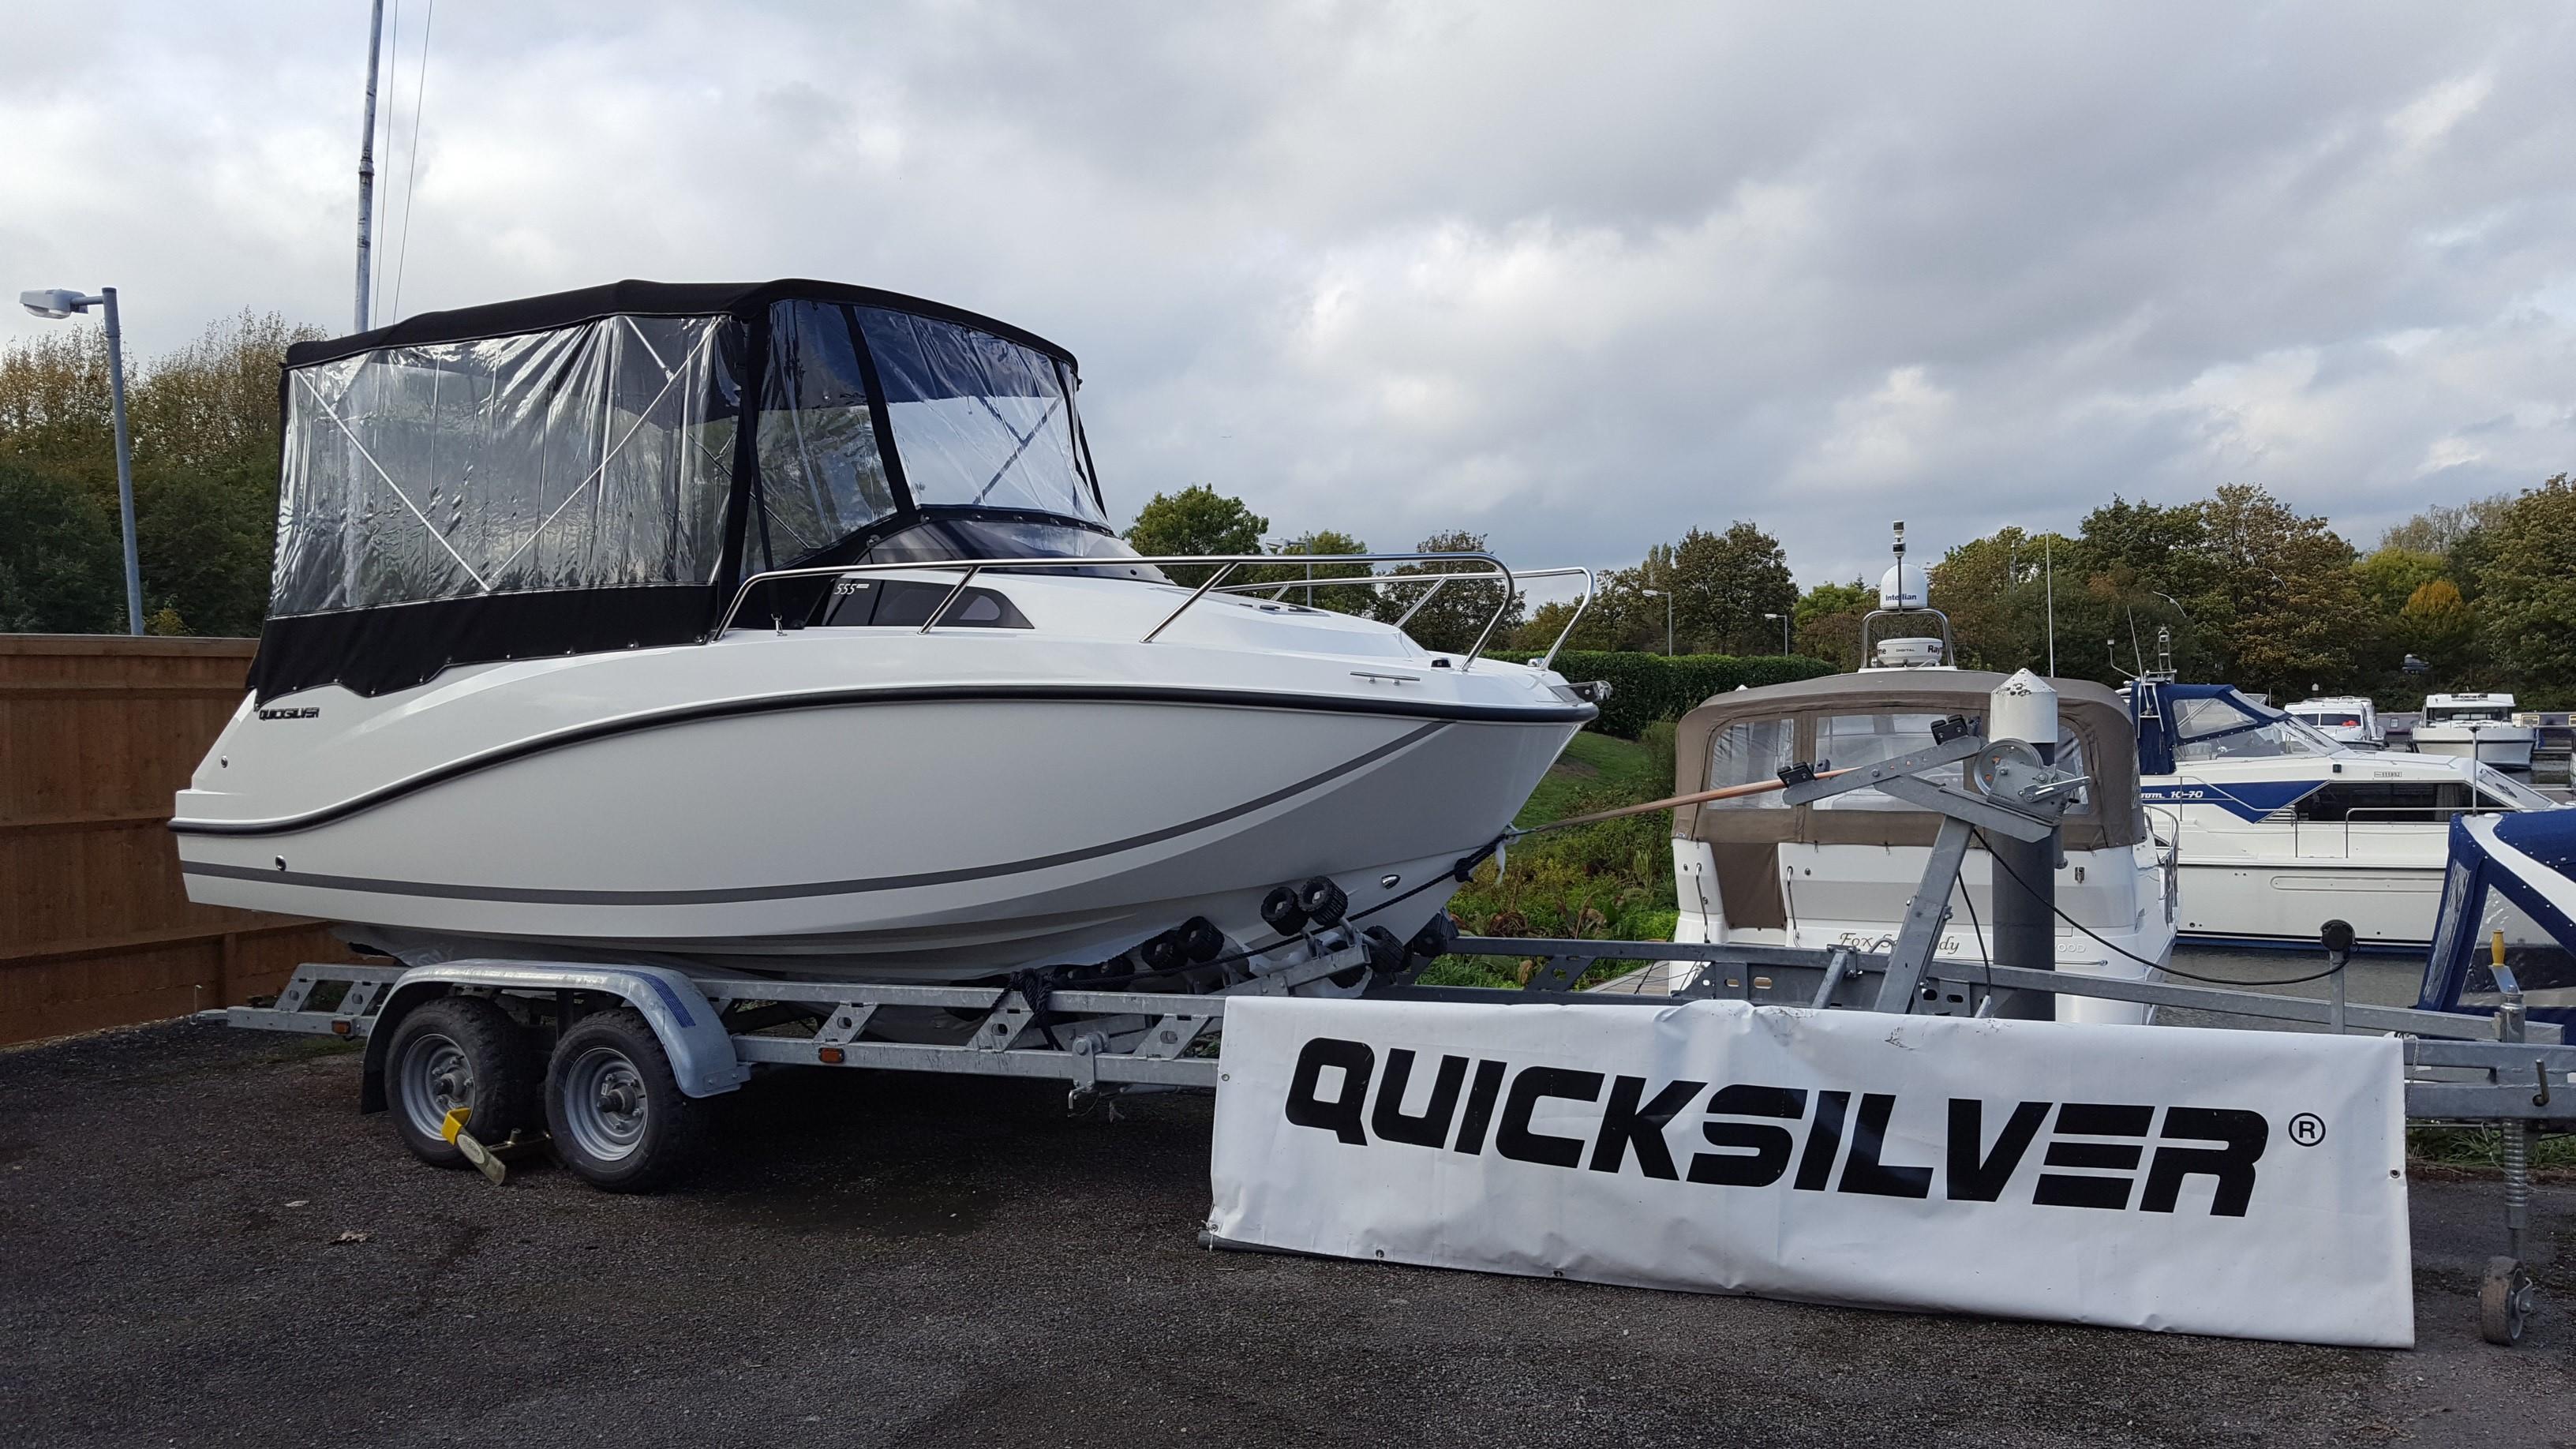 Quicksilver 555 Cabin